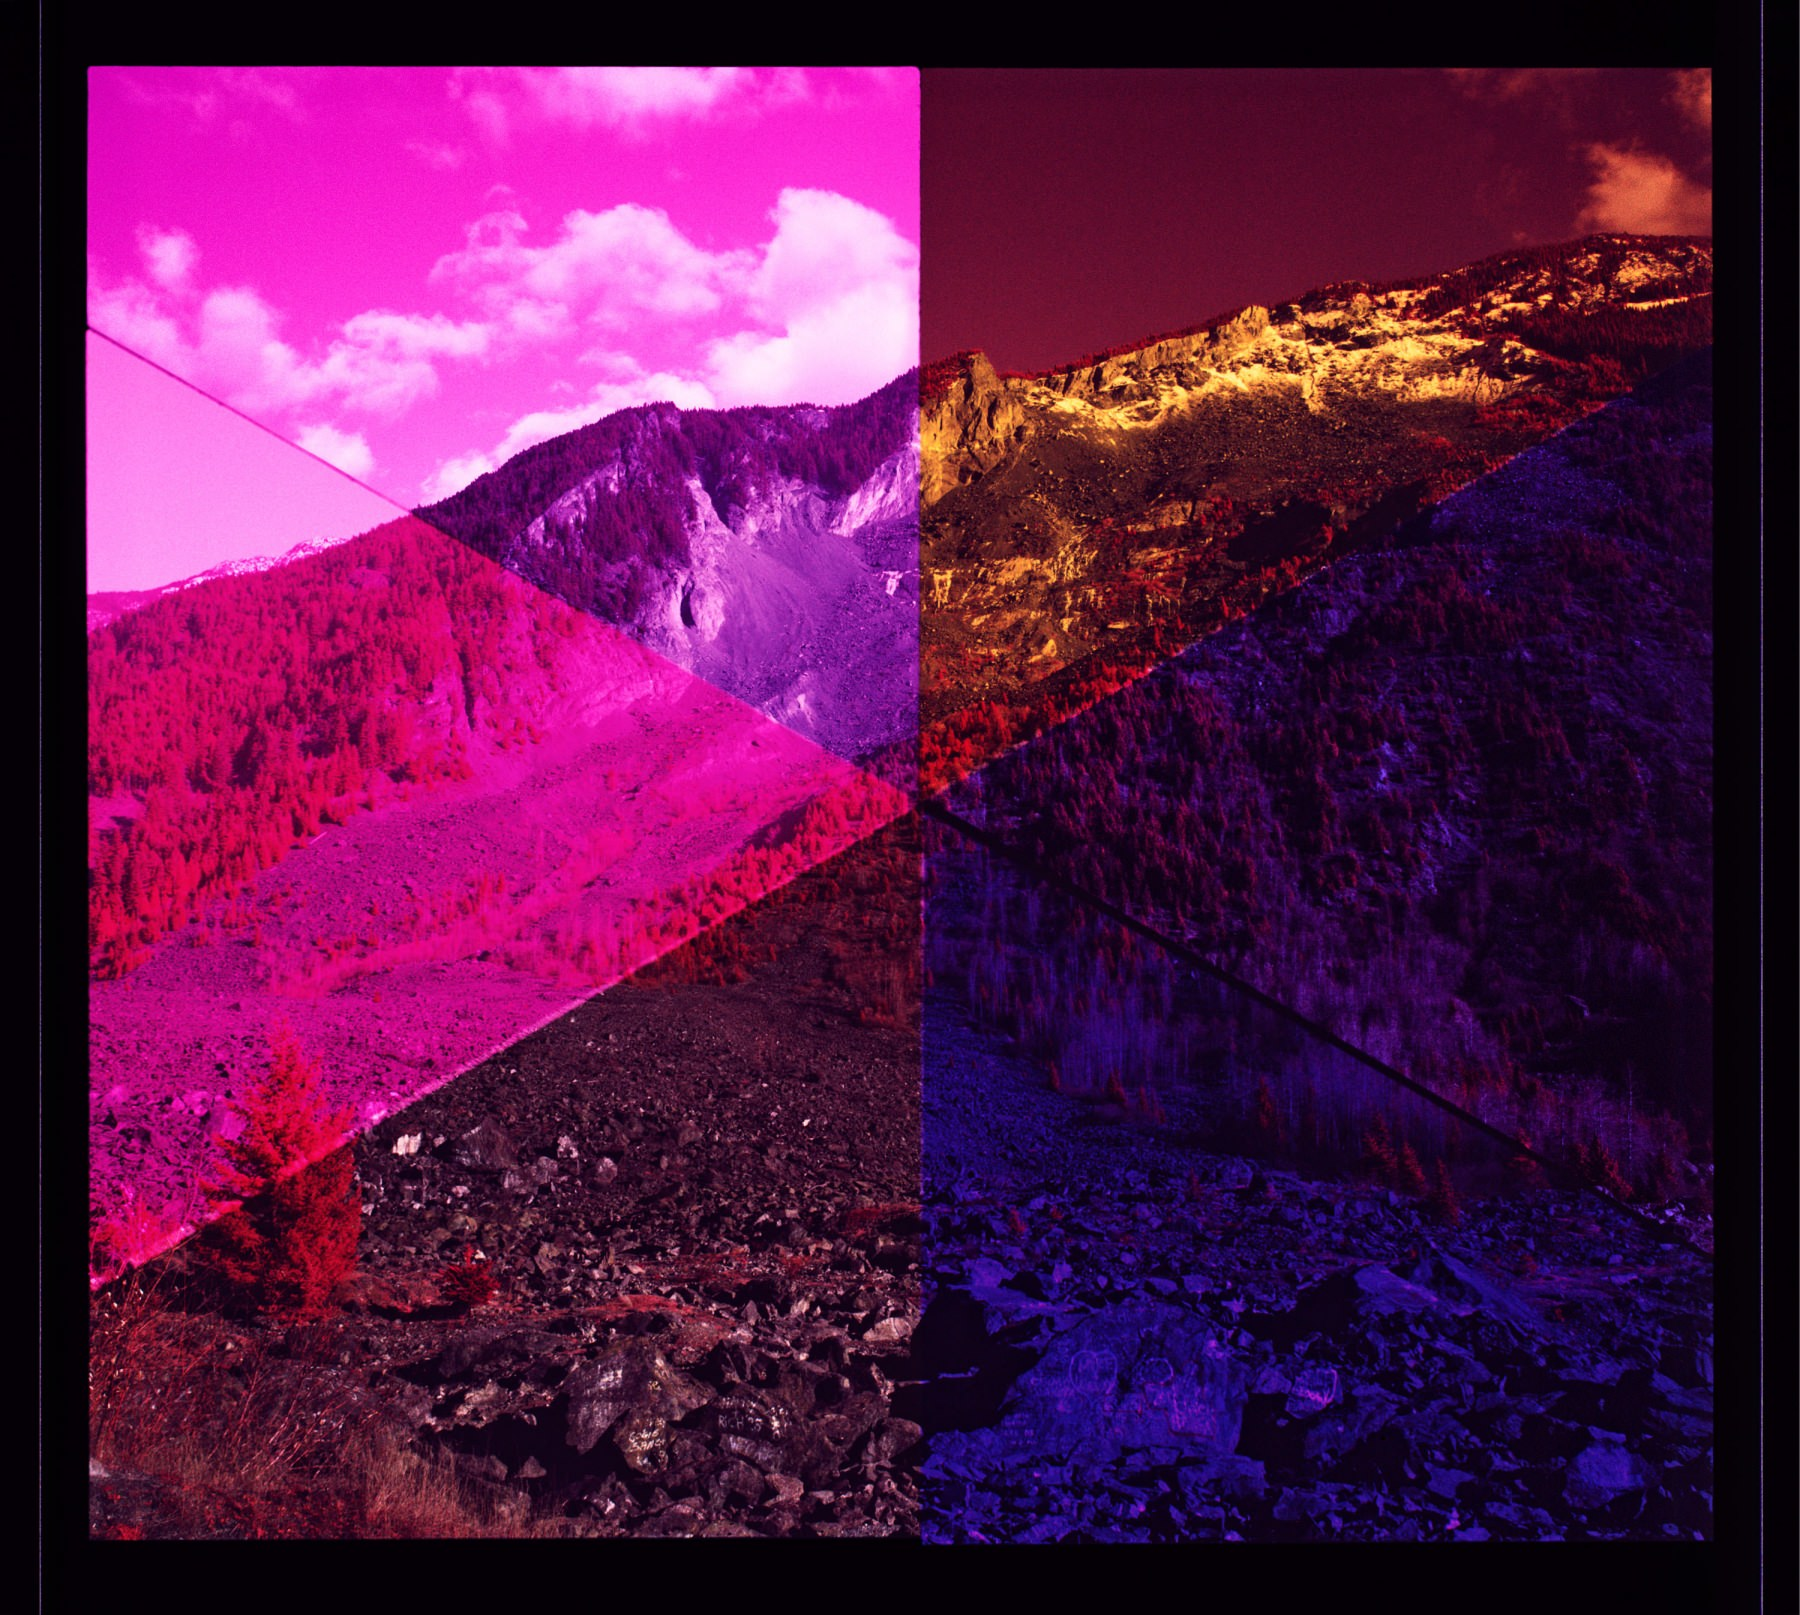 Scotty Massey, Spectrum Study 4 (infrared), 2014